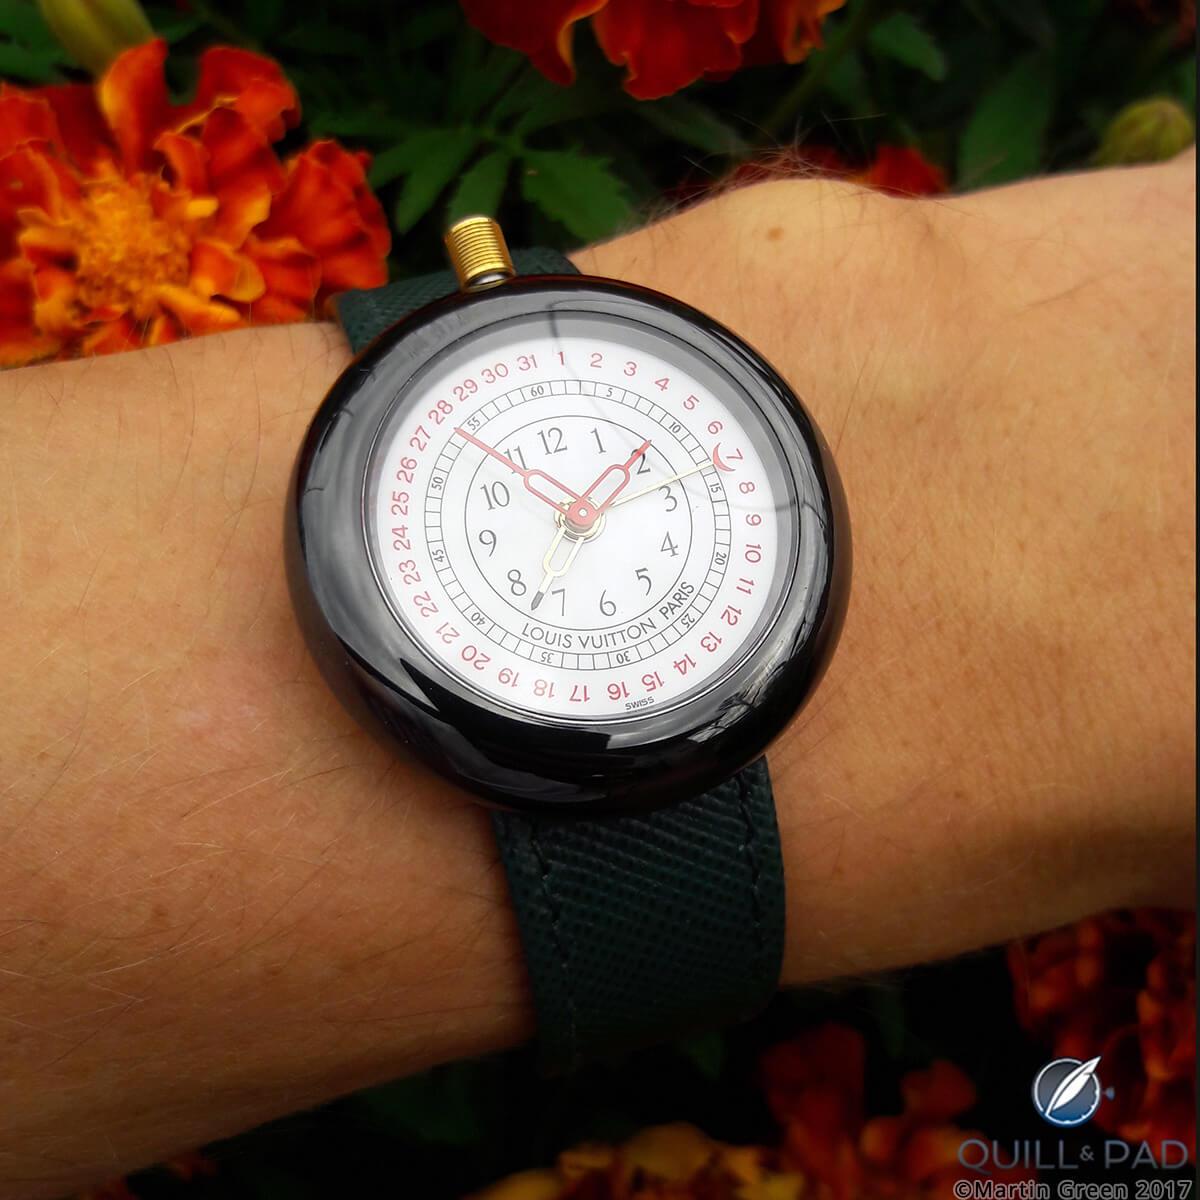 Louis Vuitton Monterey II on the wrist